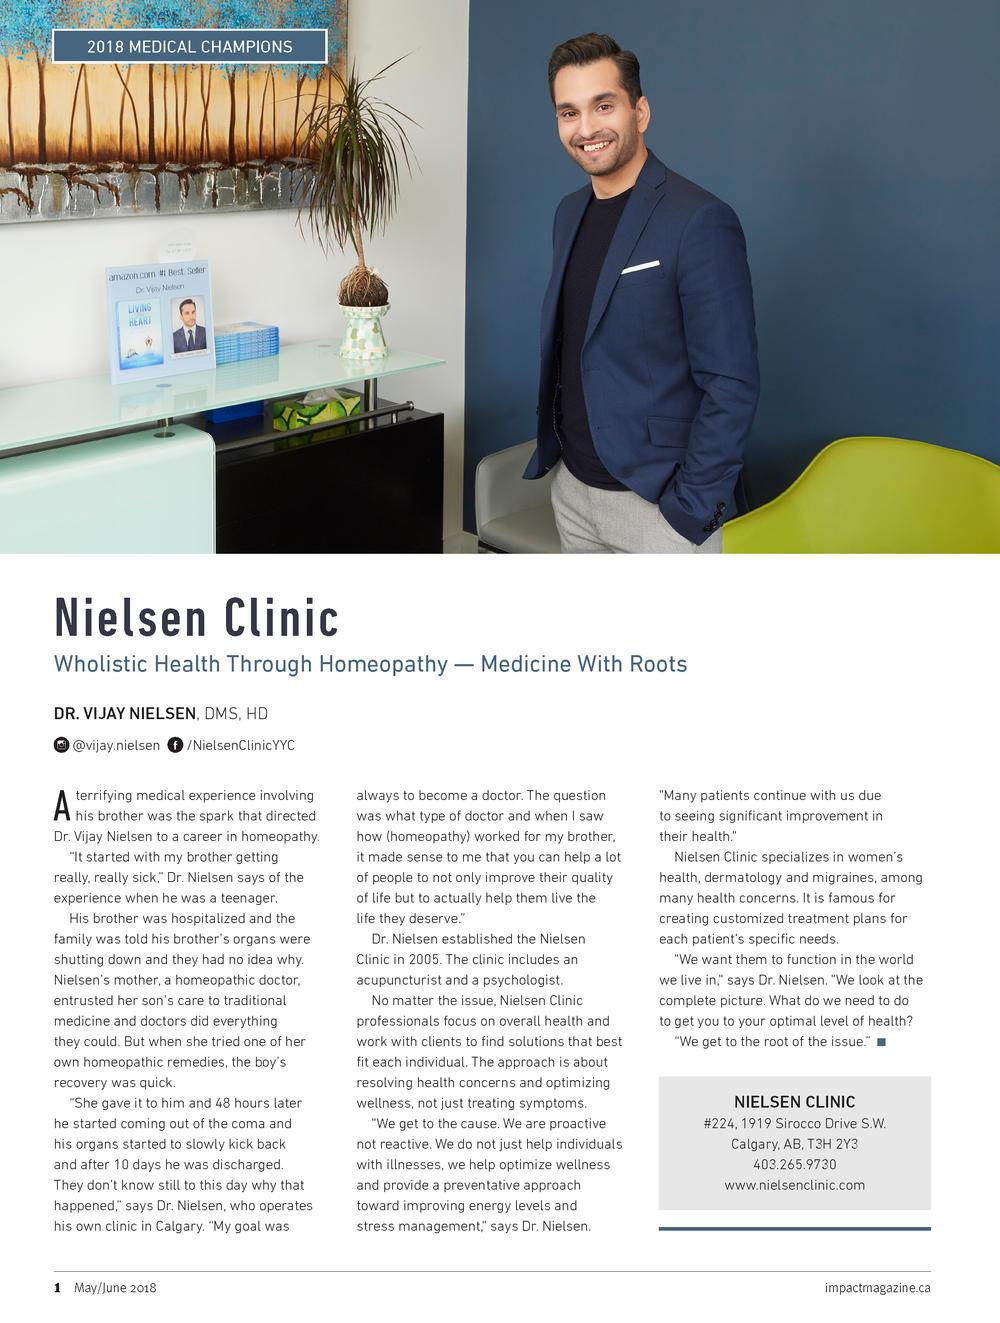 IMPACT MAGAZINE - TOP DOCTOR - Dr. Vijay Nielsen